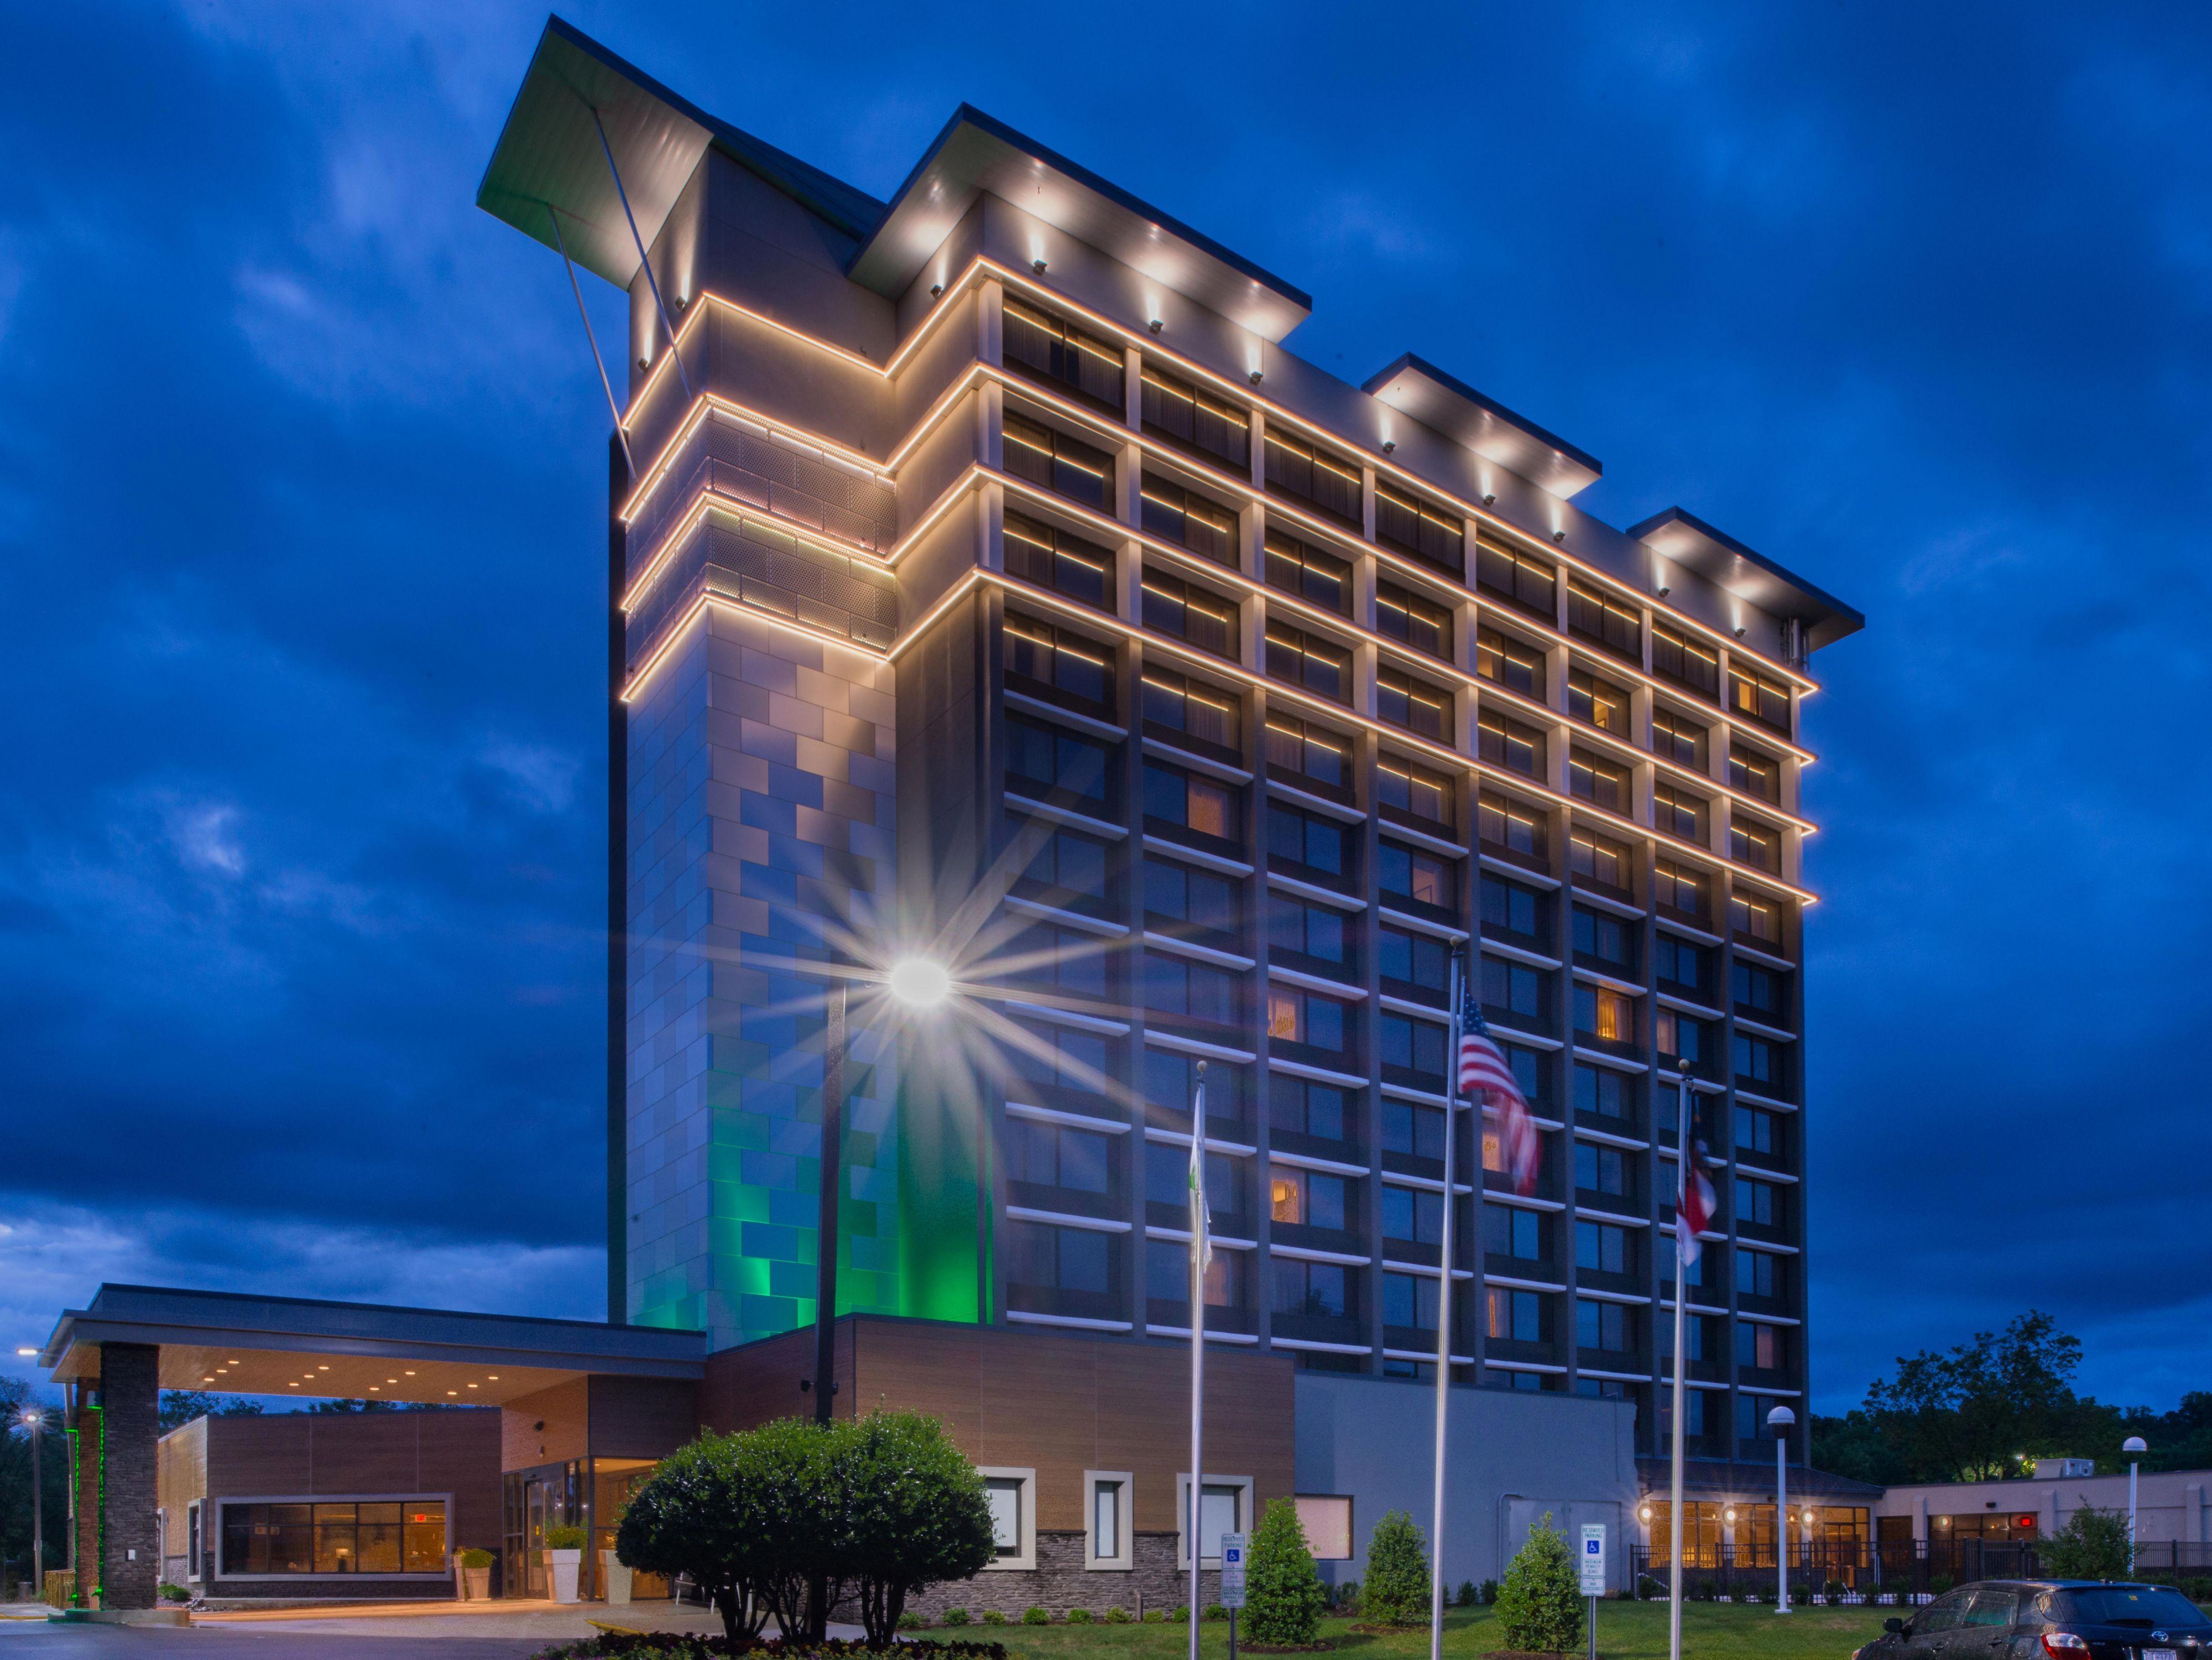 Aloft Hotel Downtown Durham Nc